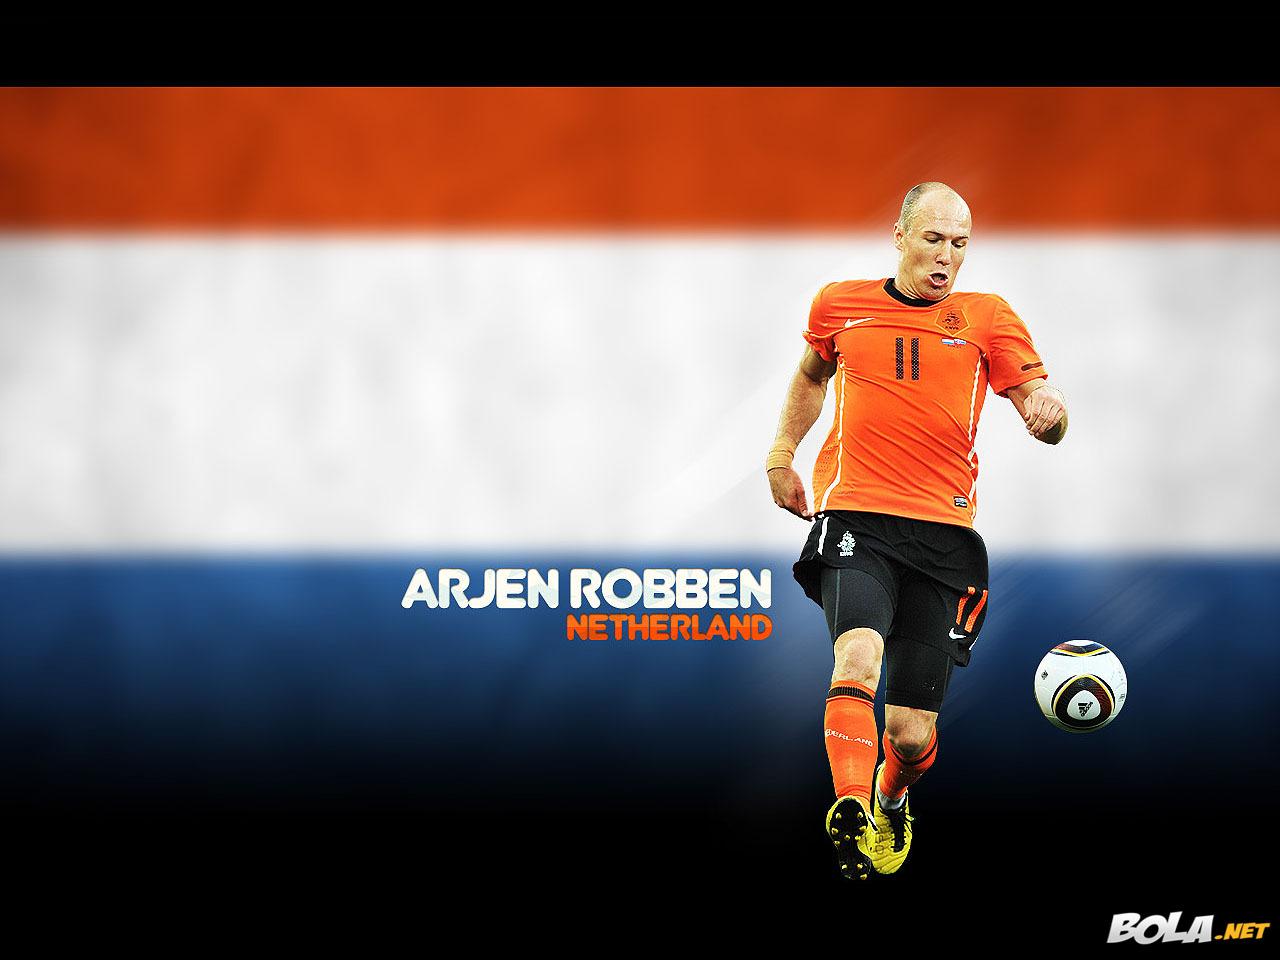 Arjen Robben Football Wallpaper